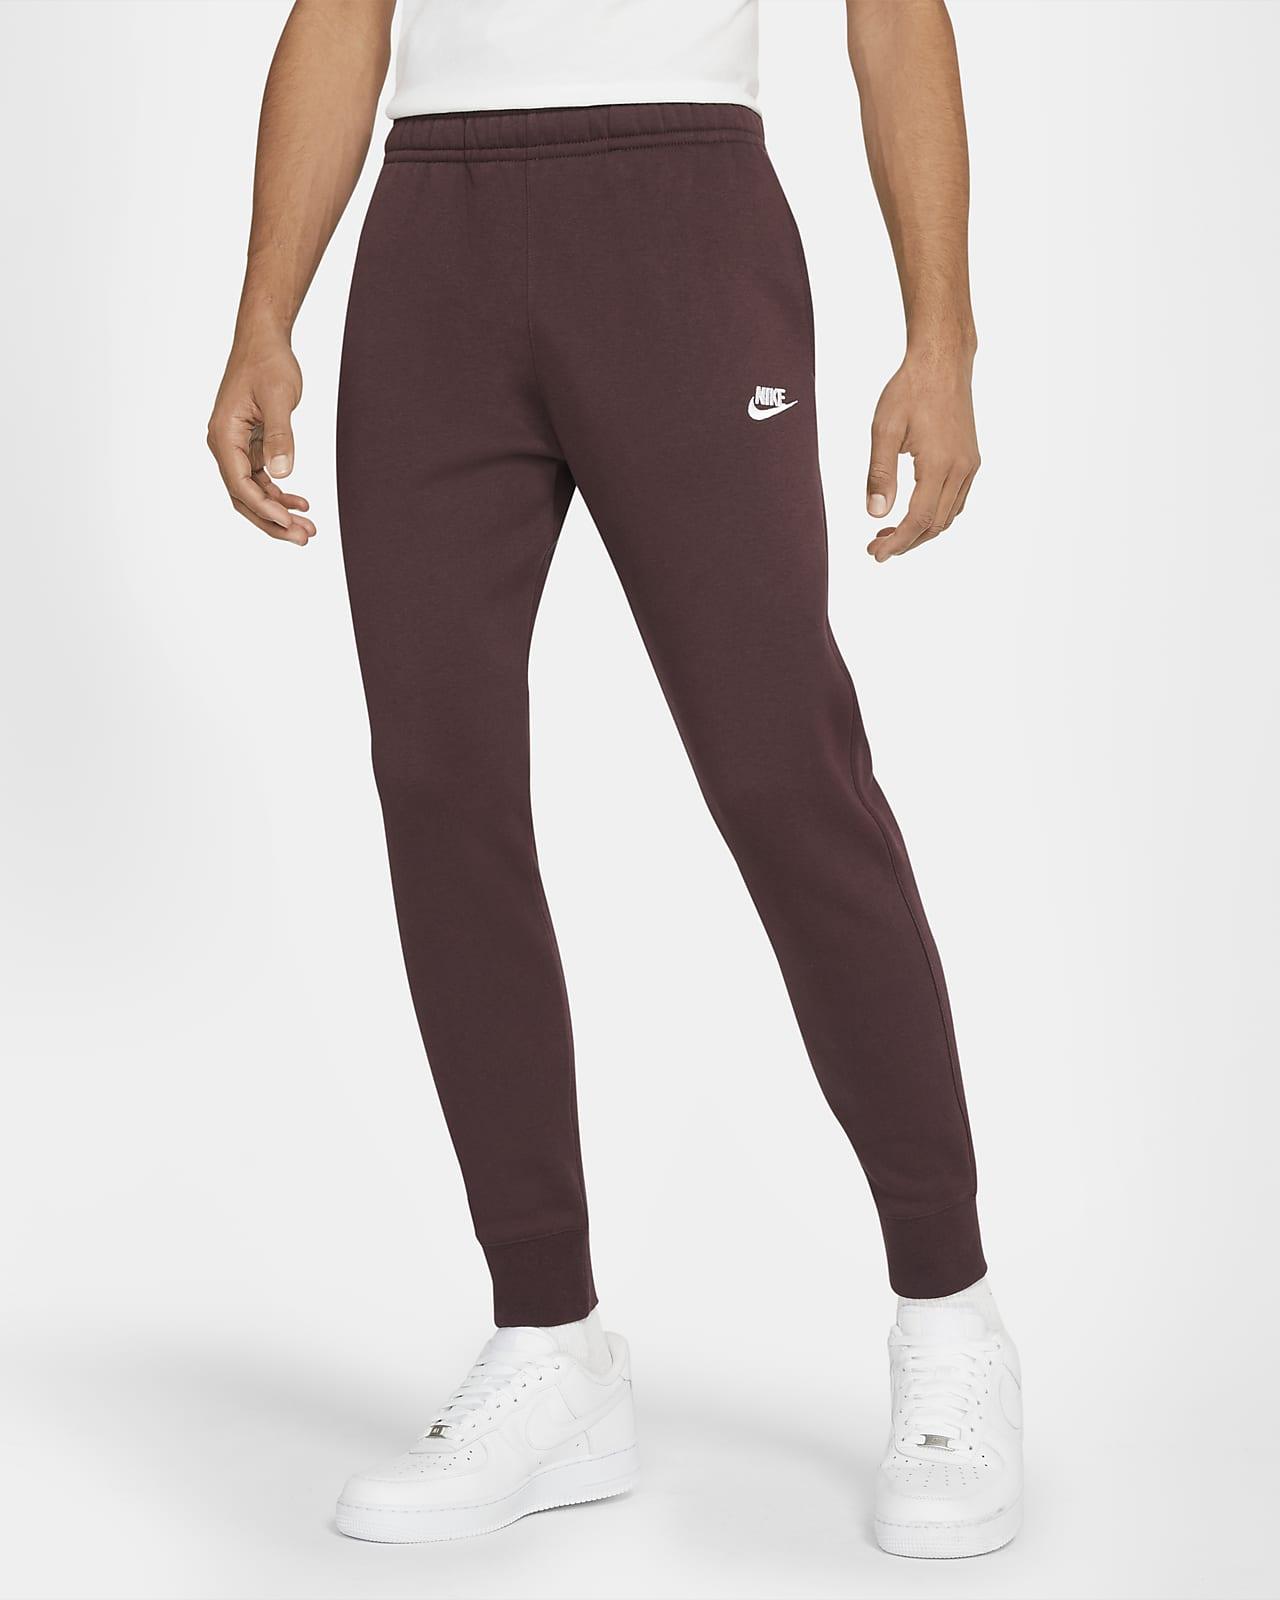 Enjuiciar misil Demostrar  Pantalon de jogging Nike Sportswear Club Fleece. Nike MA